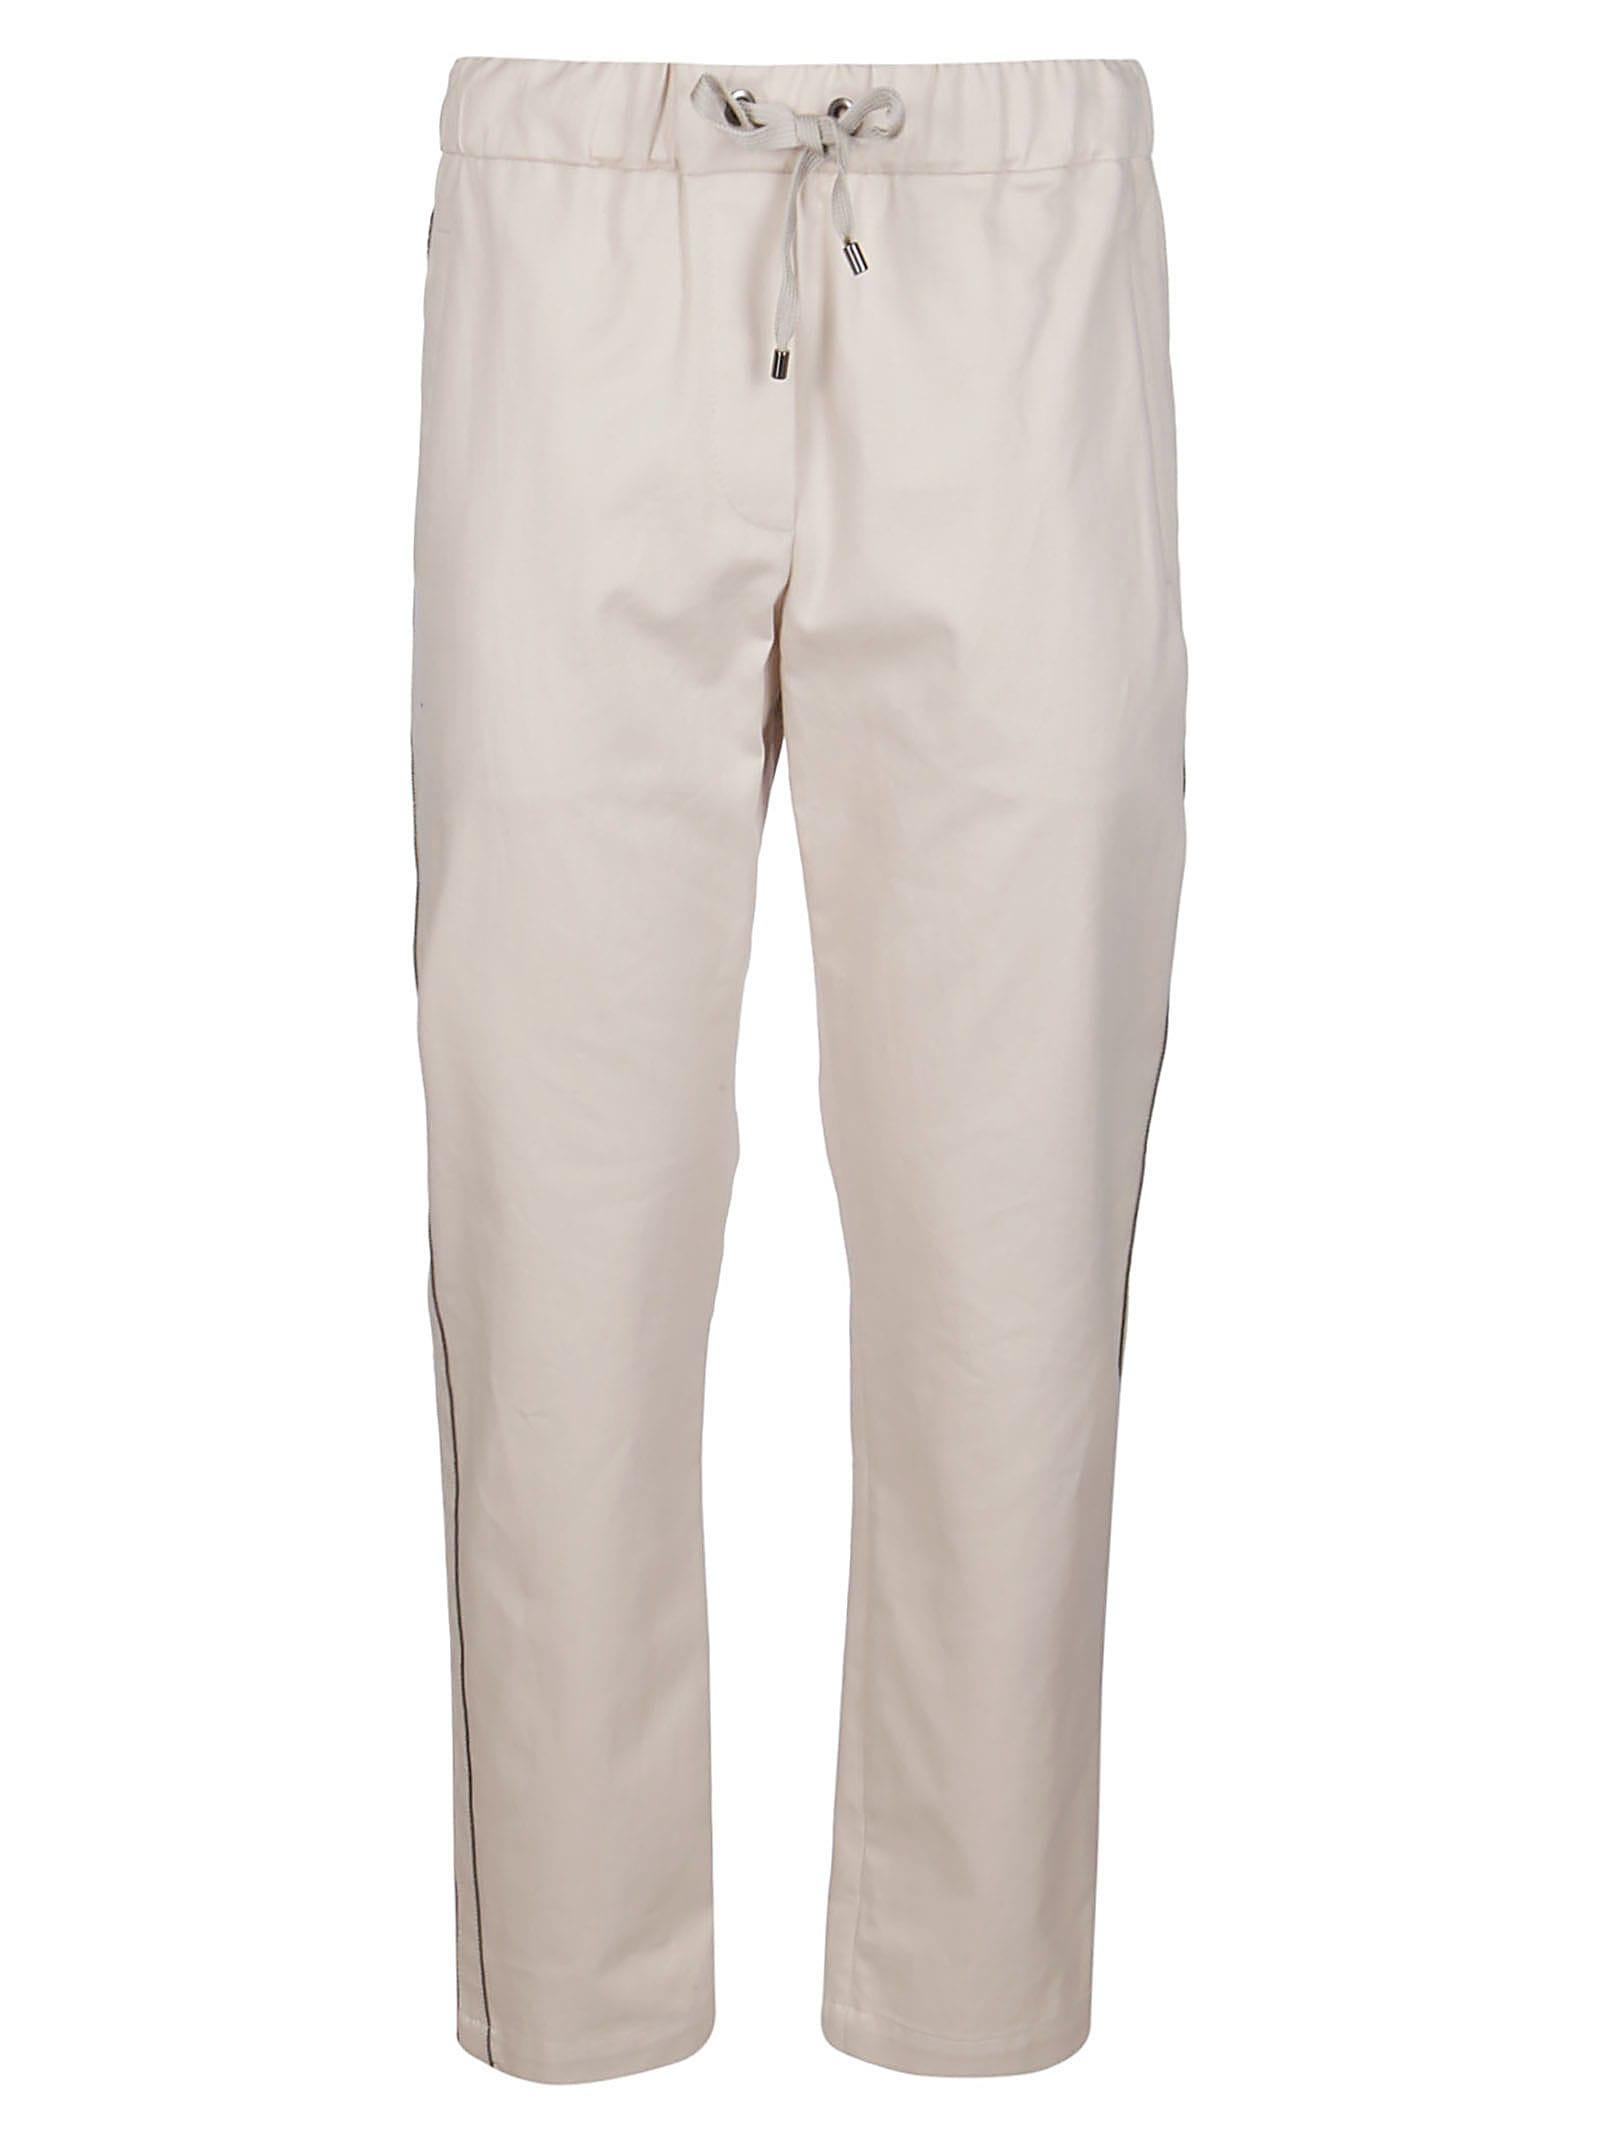 Brunello Cucinelli Beige Cotton Track Pants